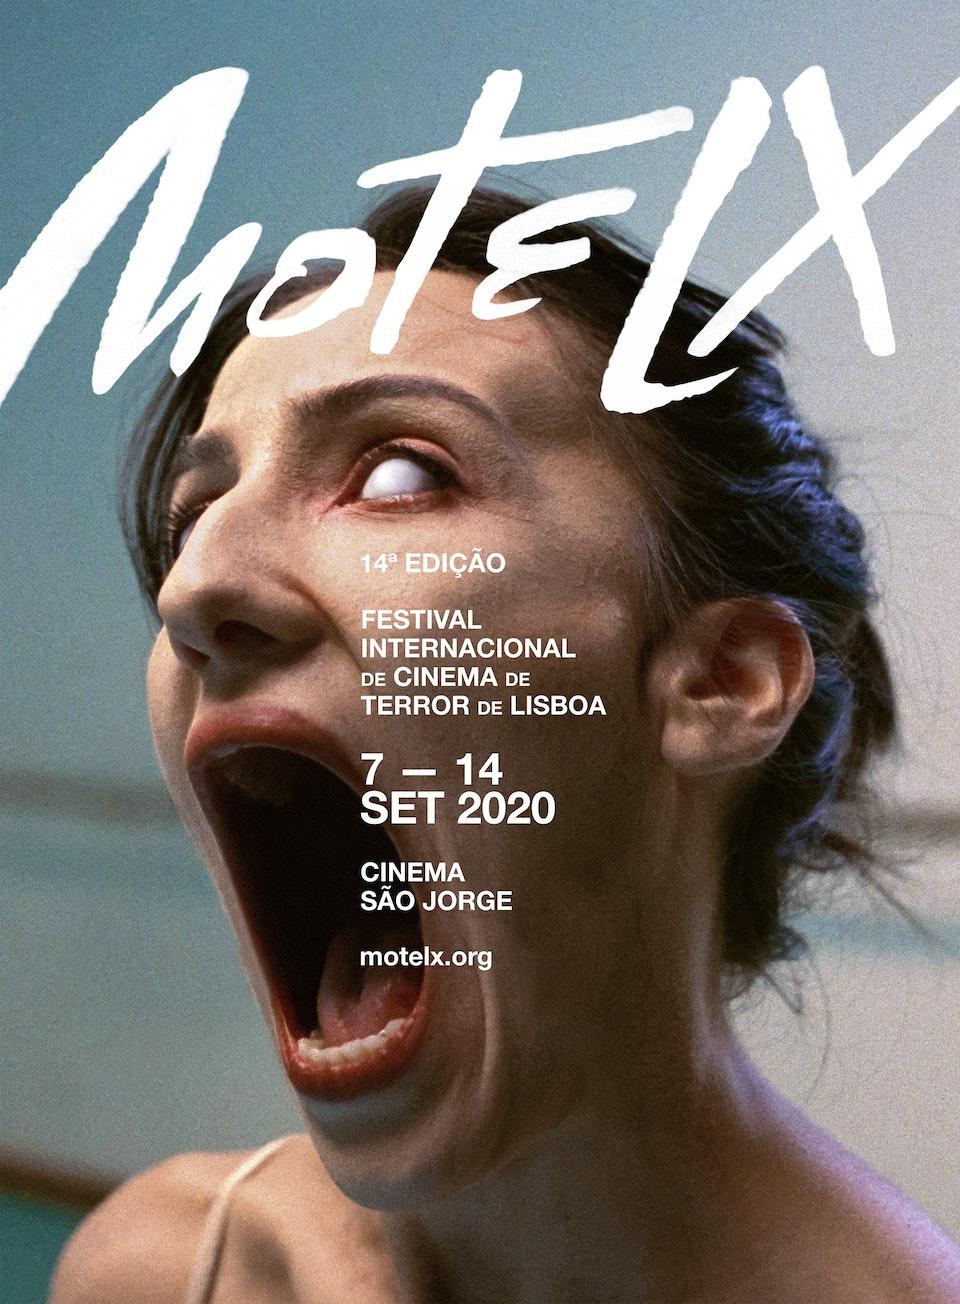 RUI VIEIRA - Film Director, Photographer & Creative Director - MOTELX 2020 - Lisbon International Horror Film Festival